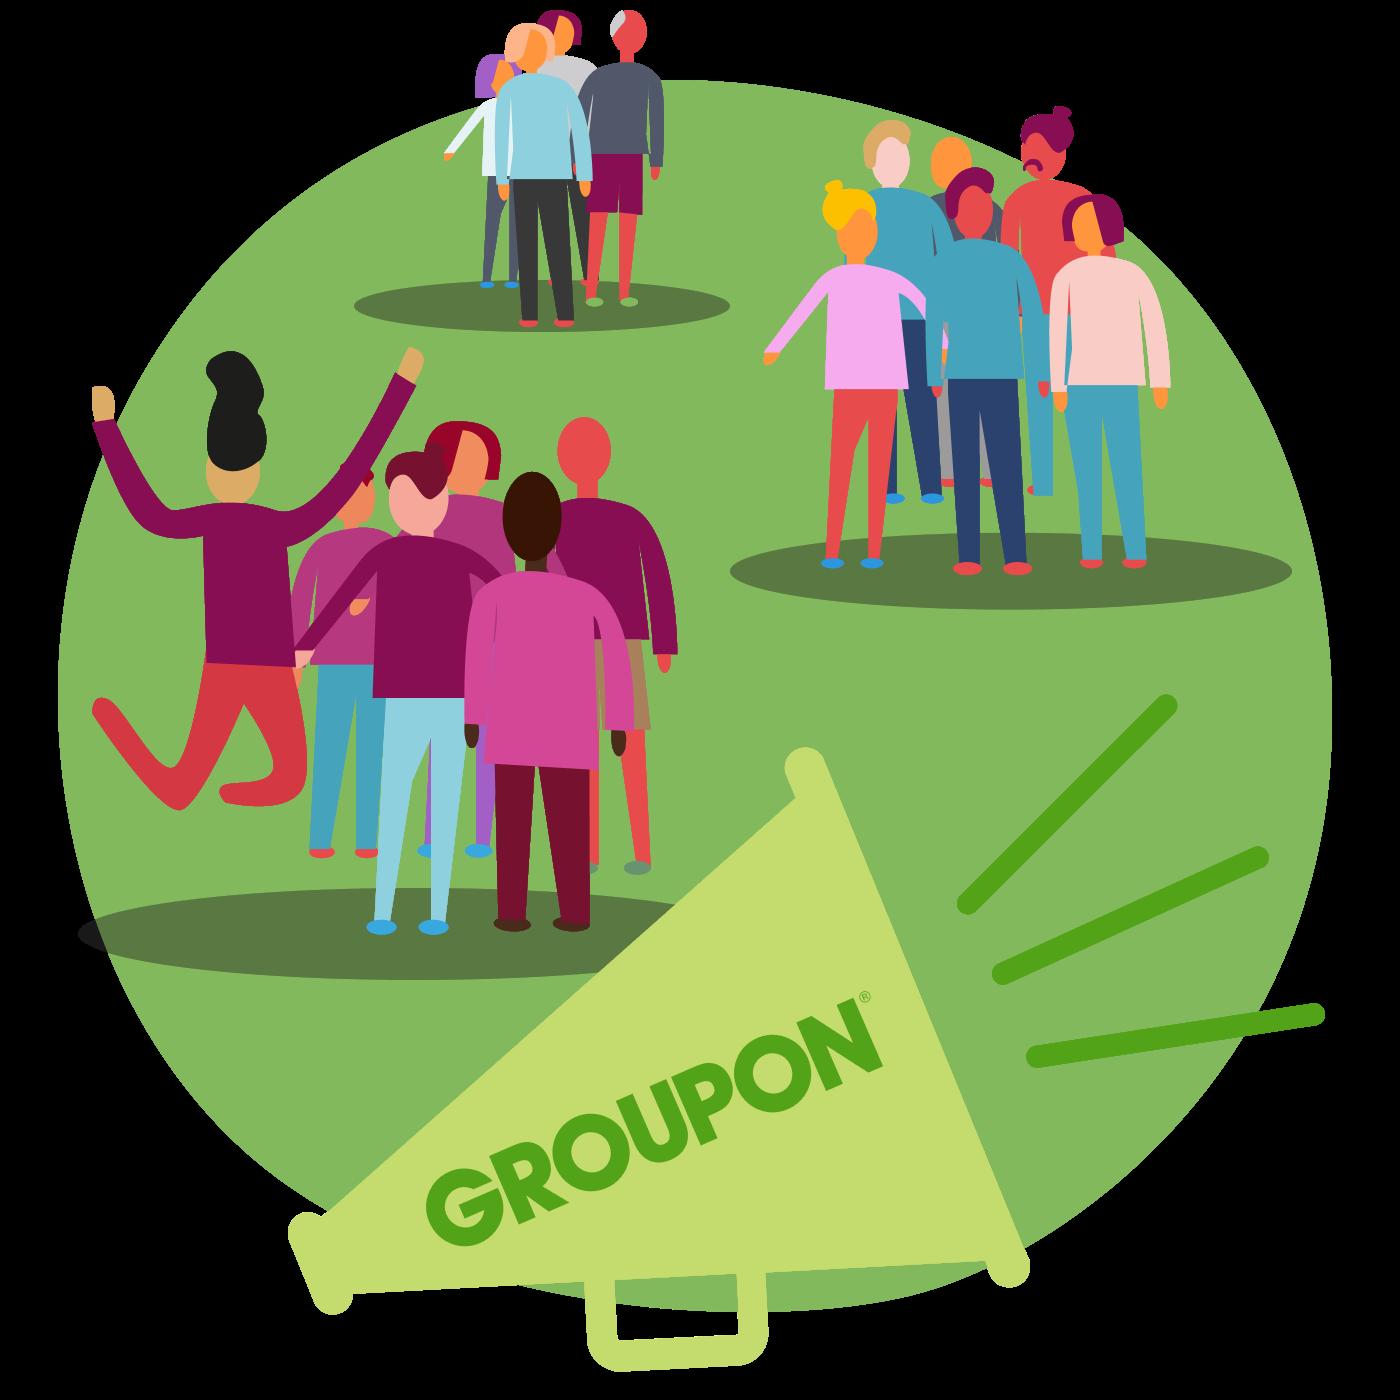 broadcast groupon-1